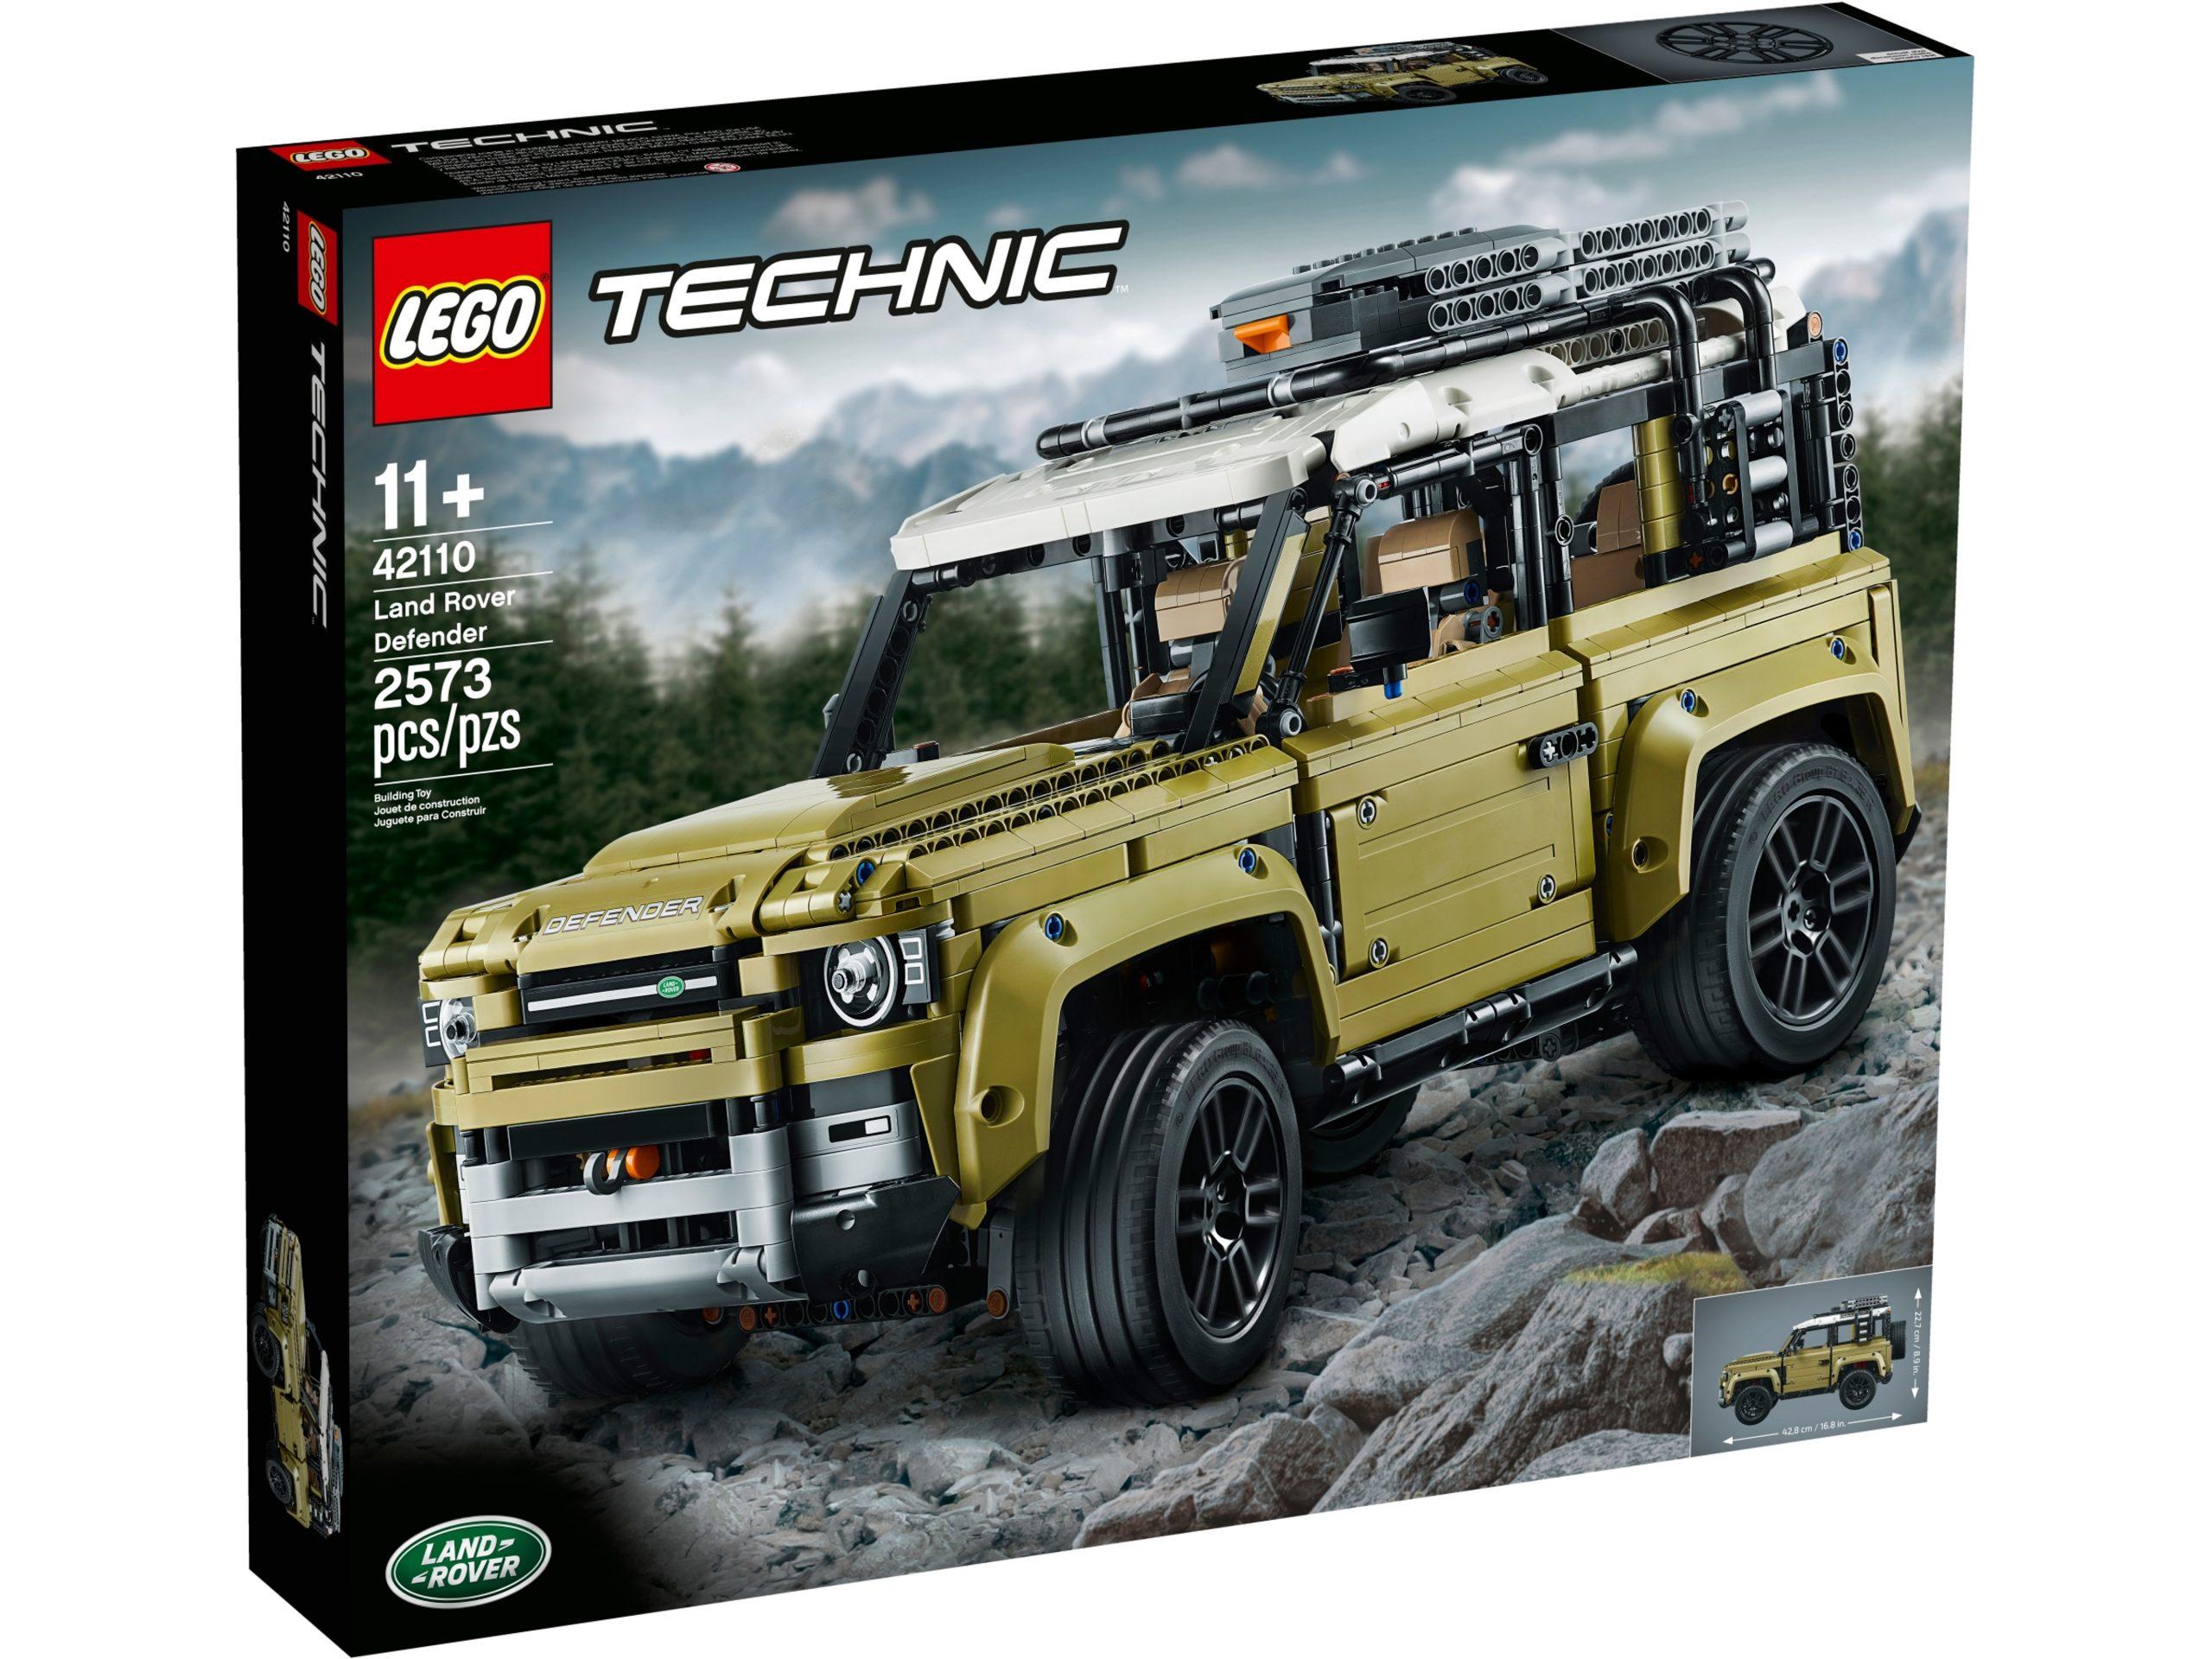 lego 42110 land rover defender scaled